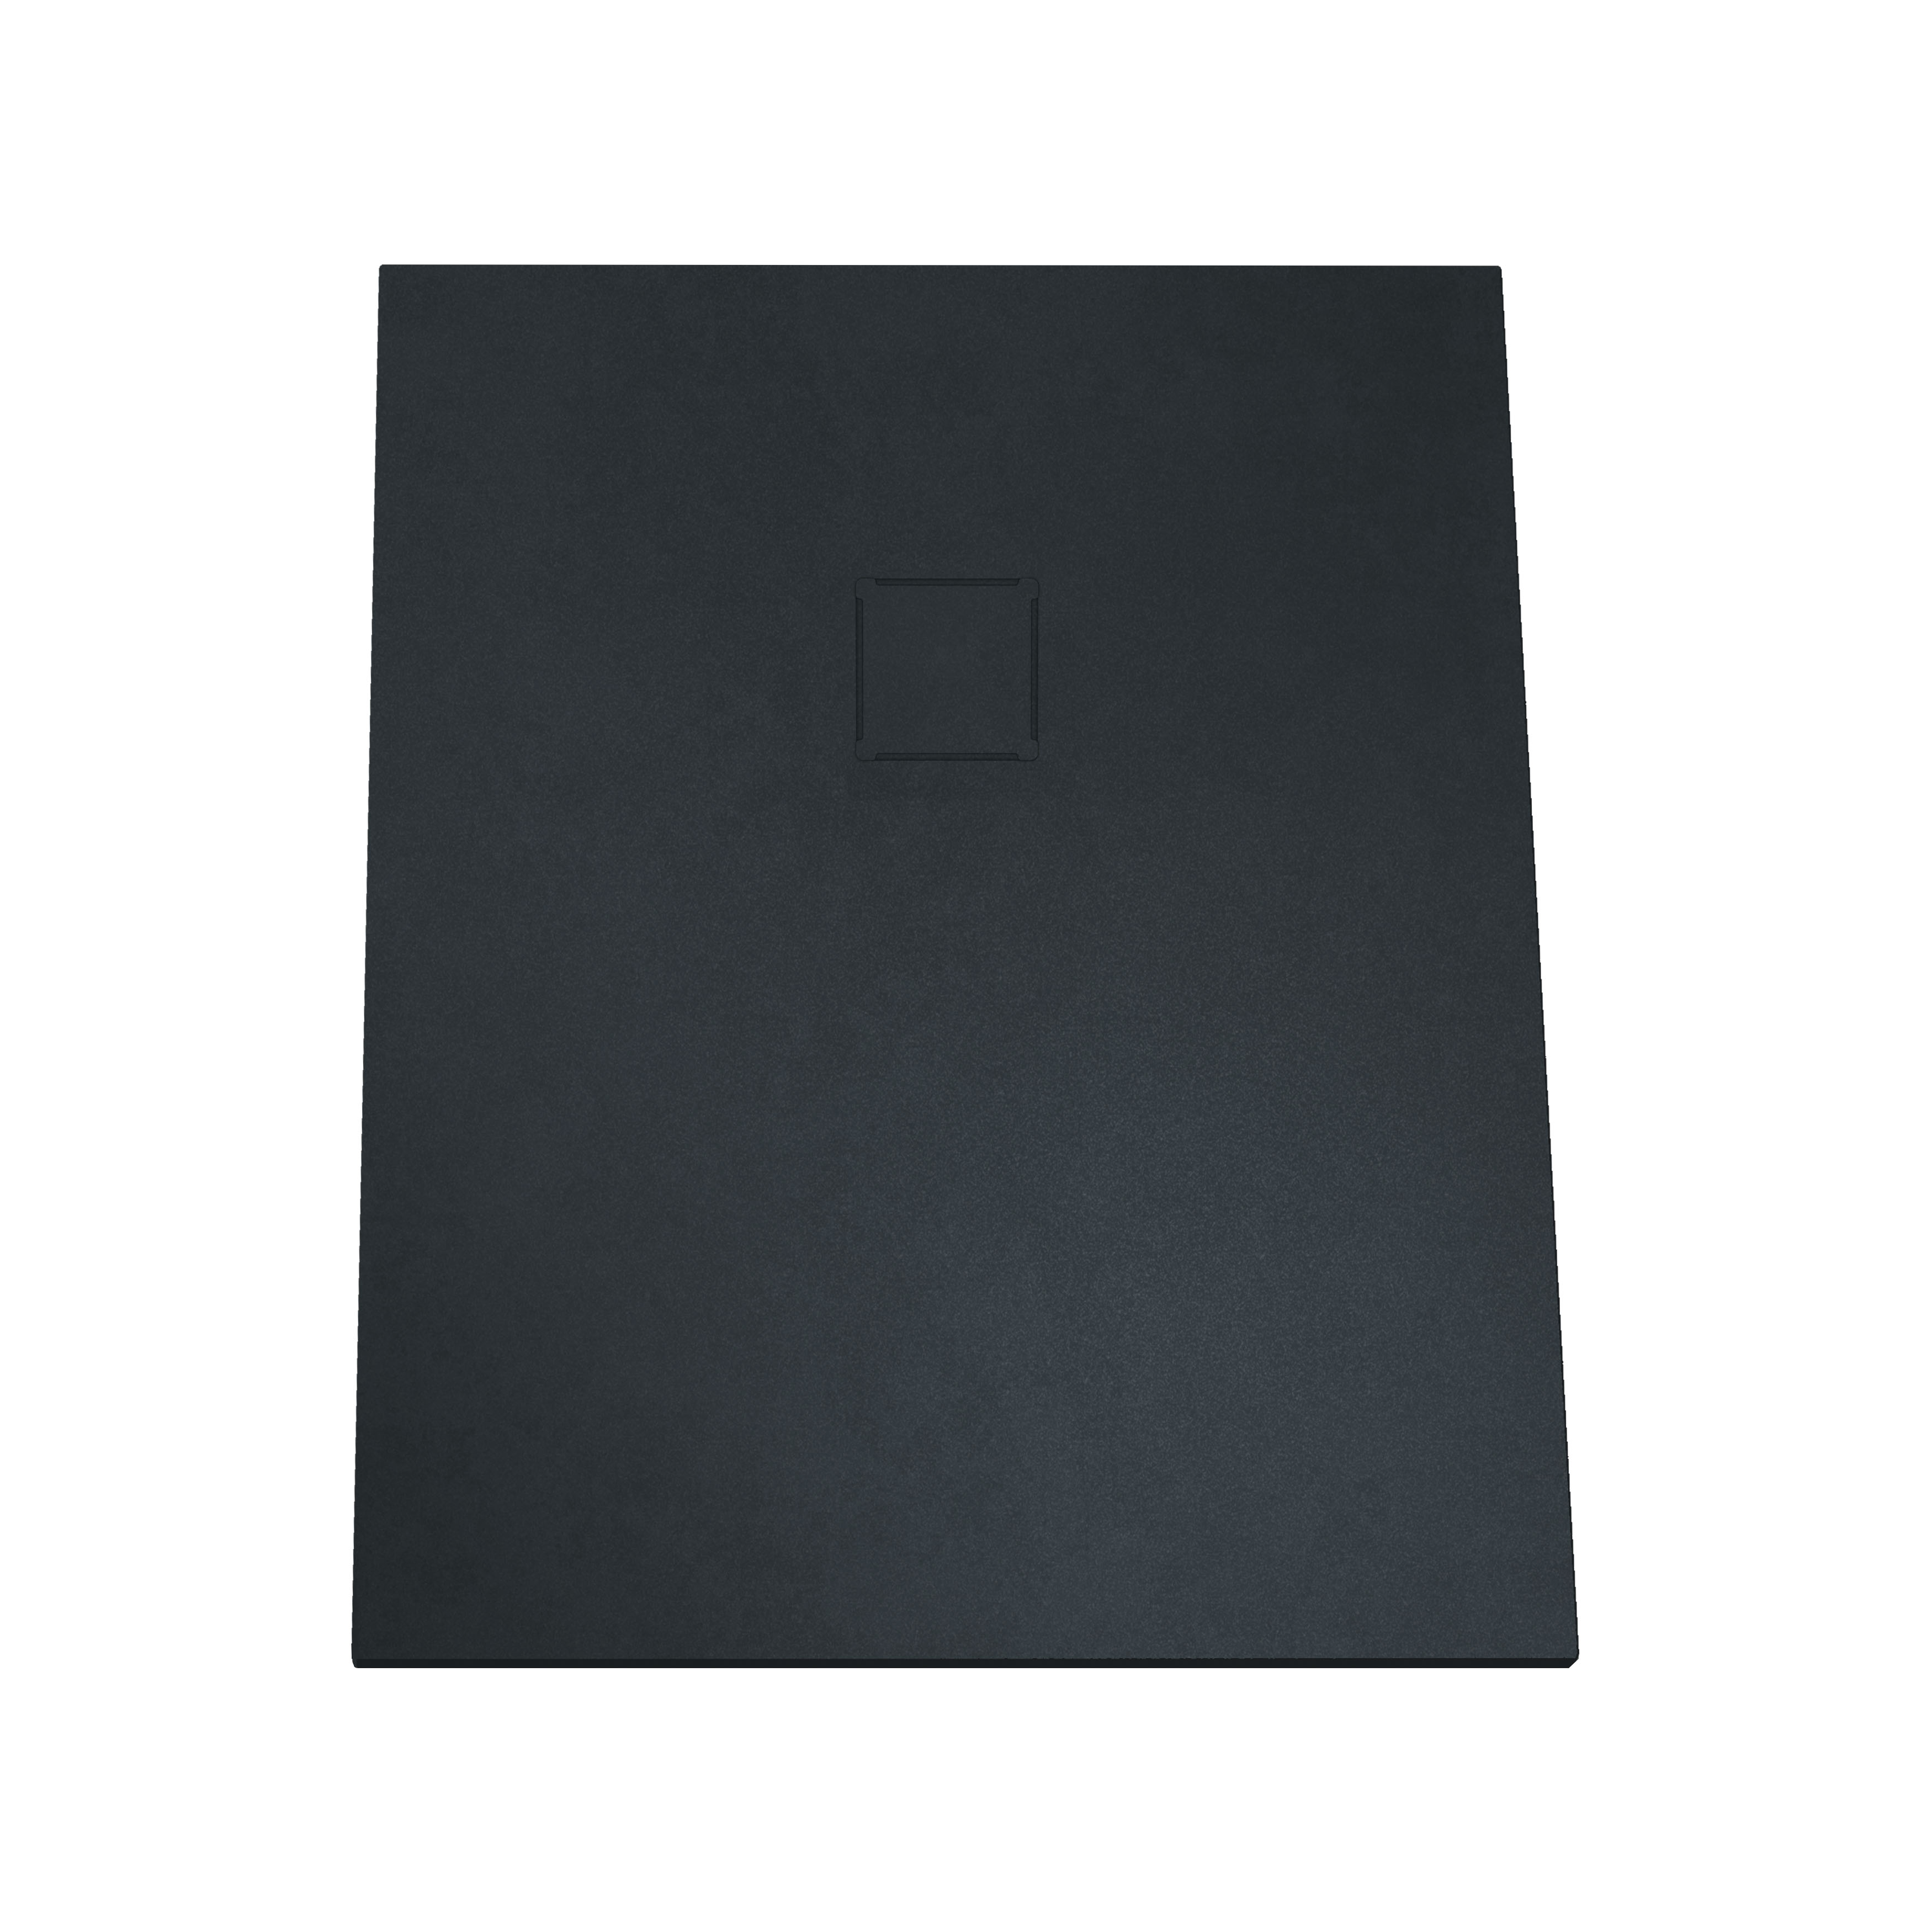 V-stone, receveur ultra plat en solid stone, 100  x  80 cm, anthraciteacite